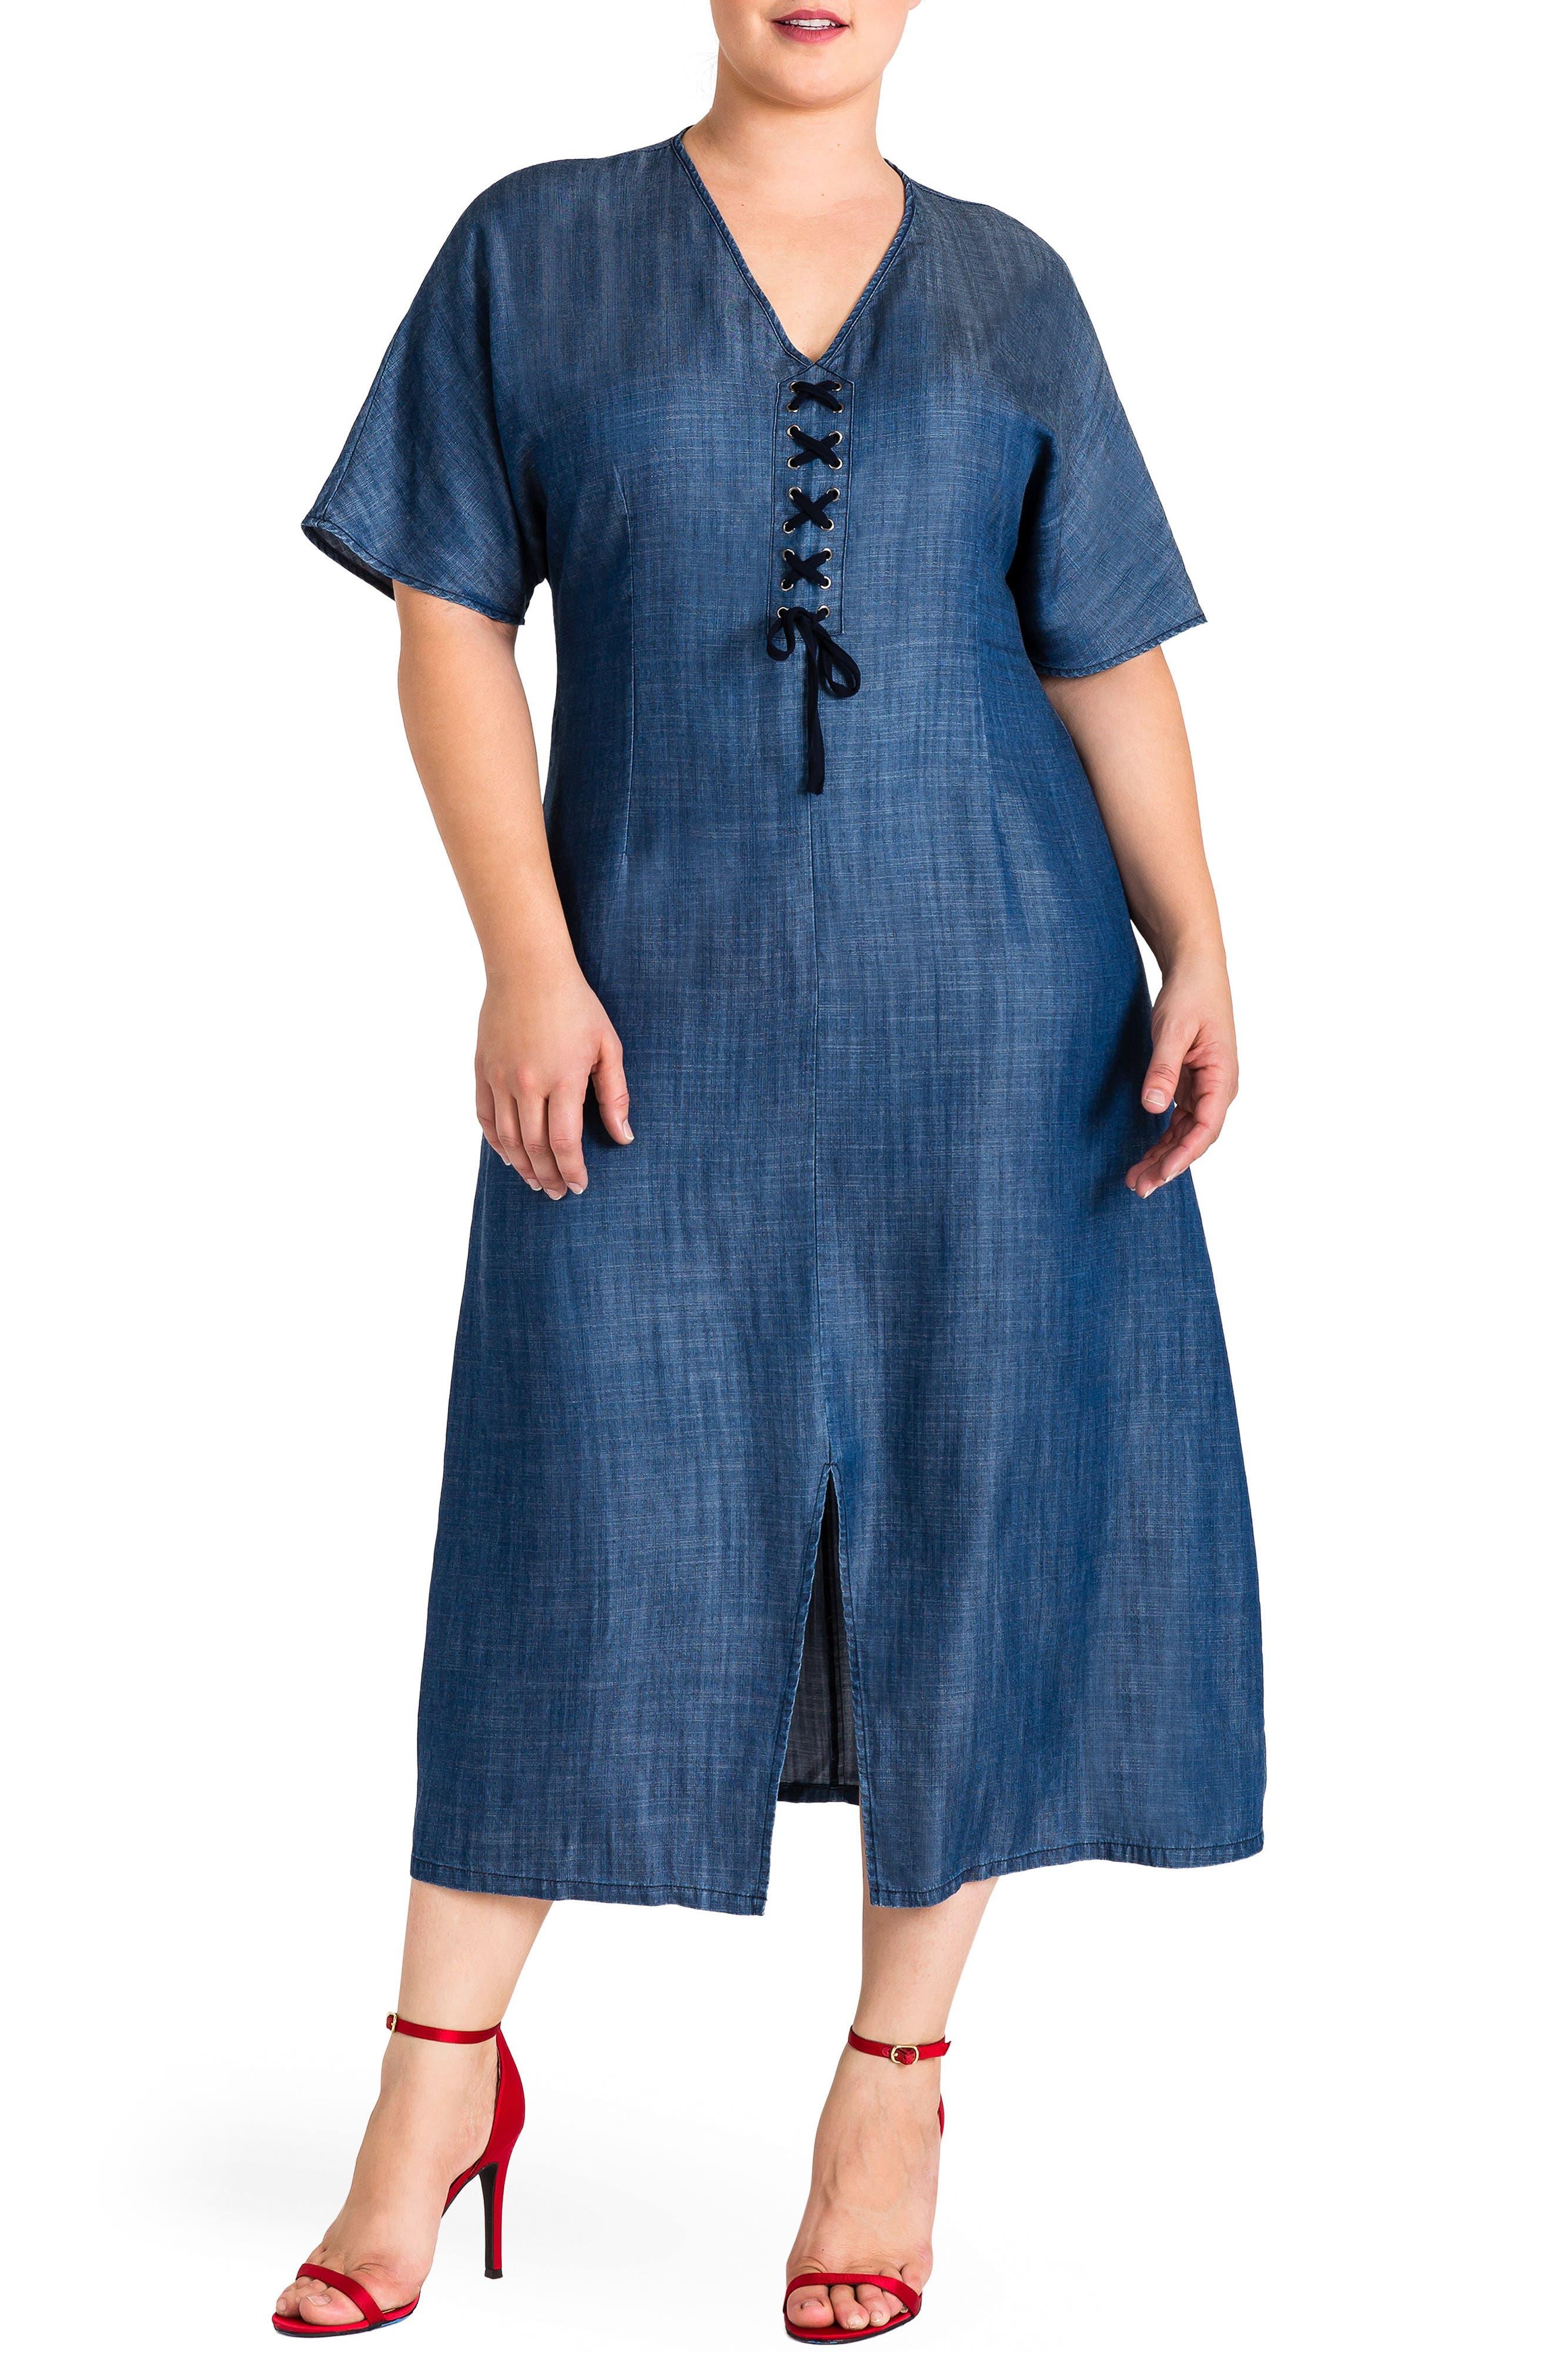 Standard & Practices Meme Tencel Midi Dress,                         Main,                         color, NAVY